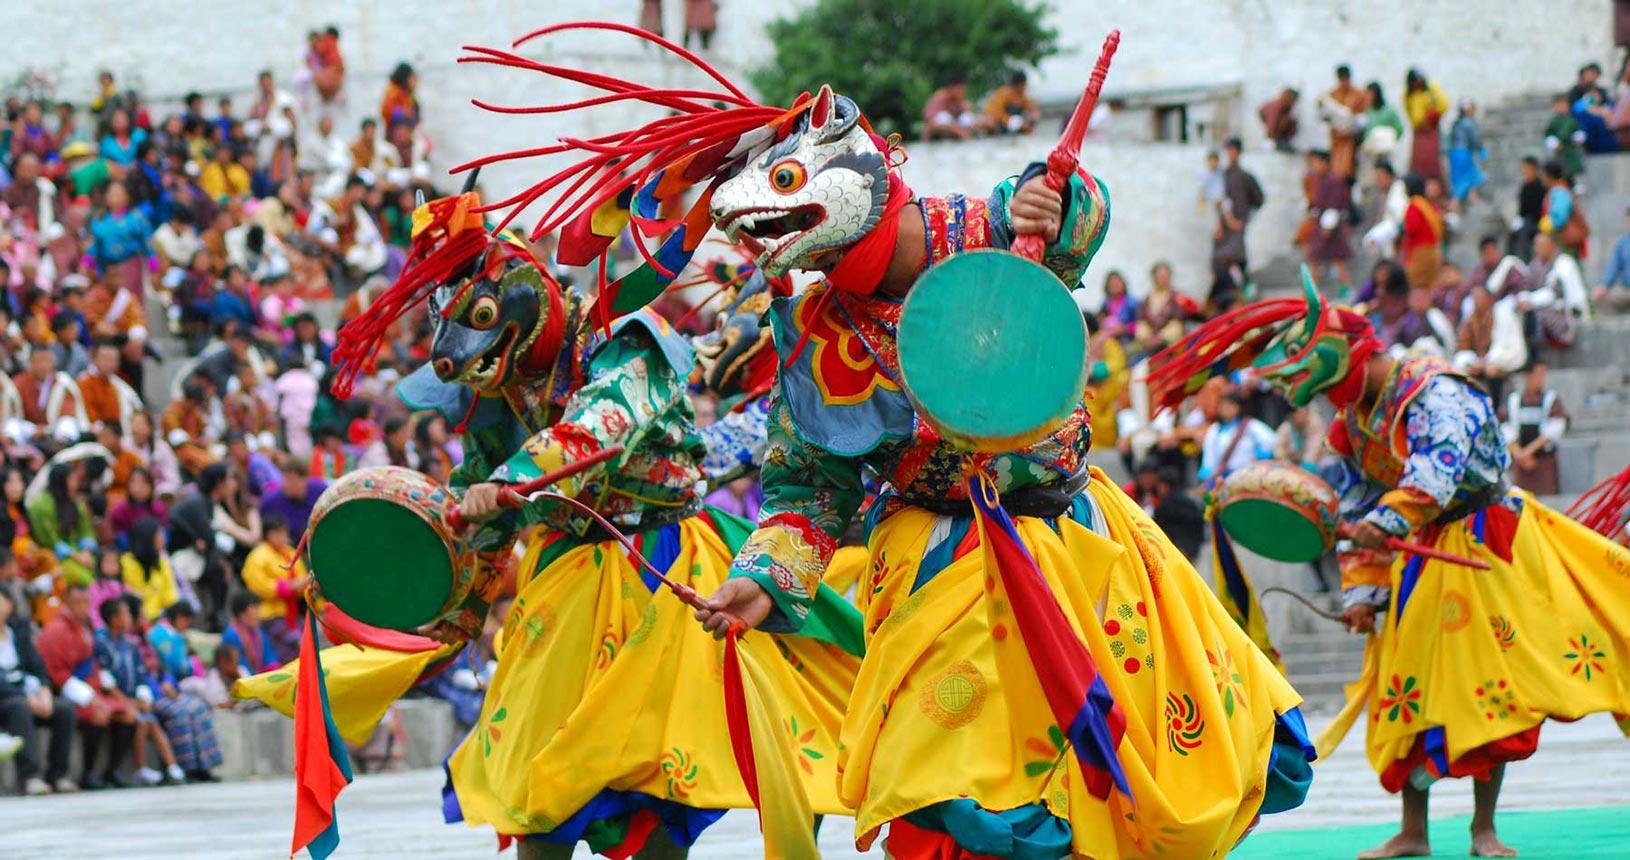 Jambay Lhakang Drup Festival in Bhutan